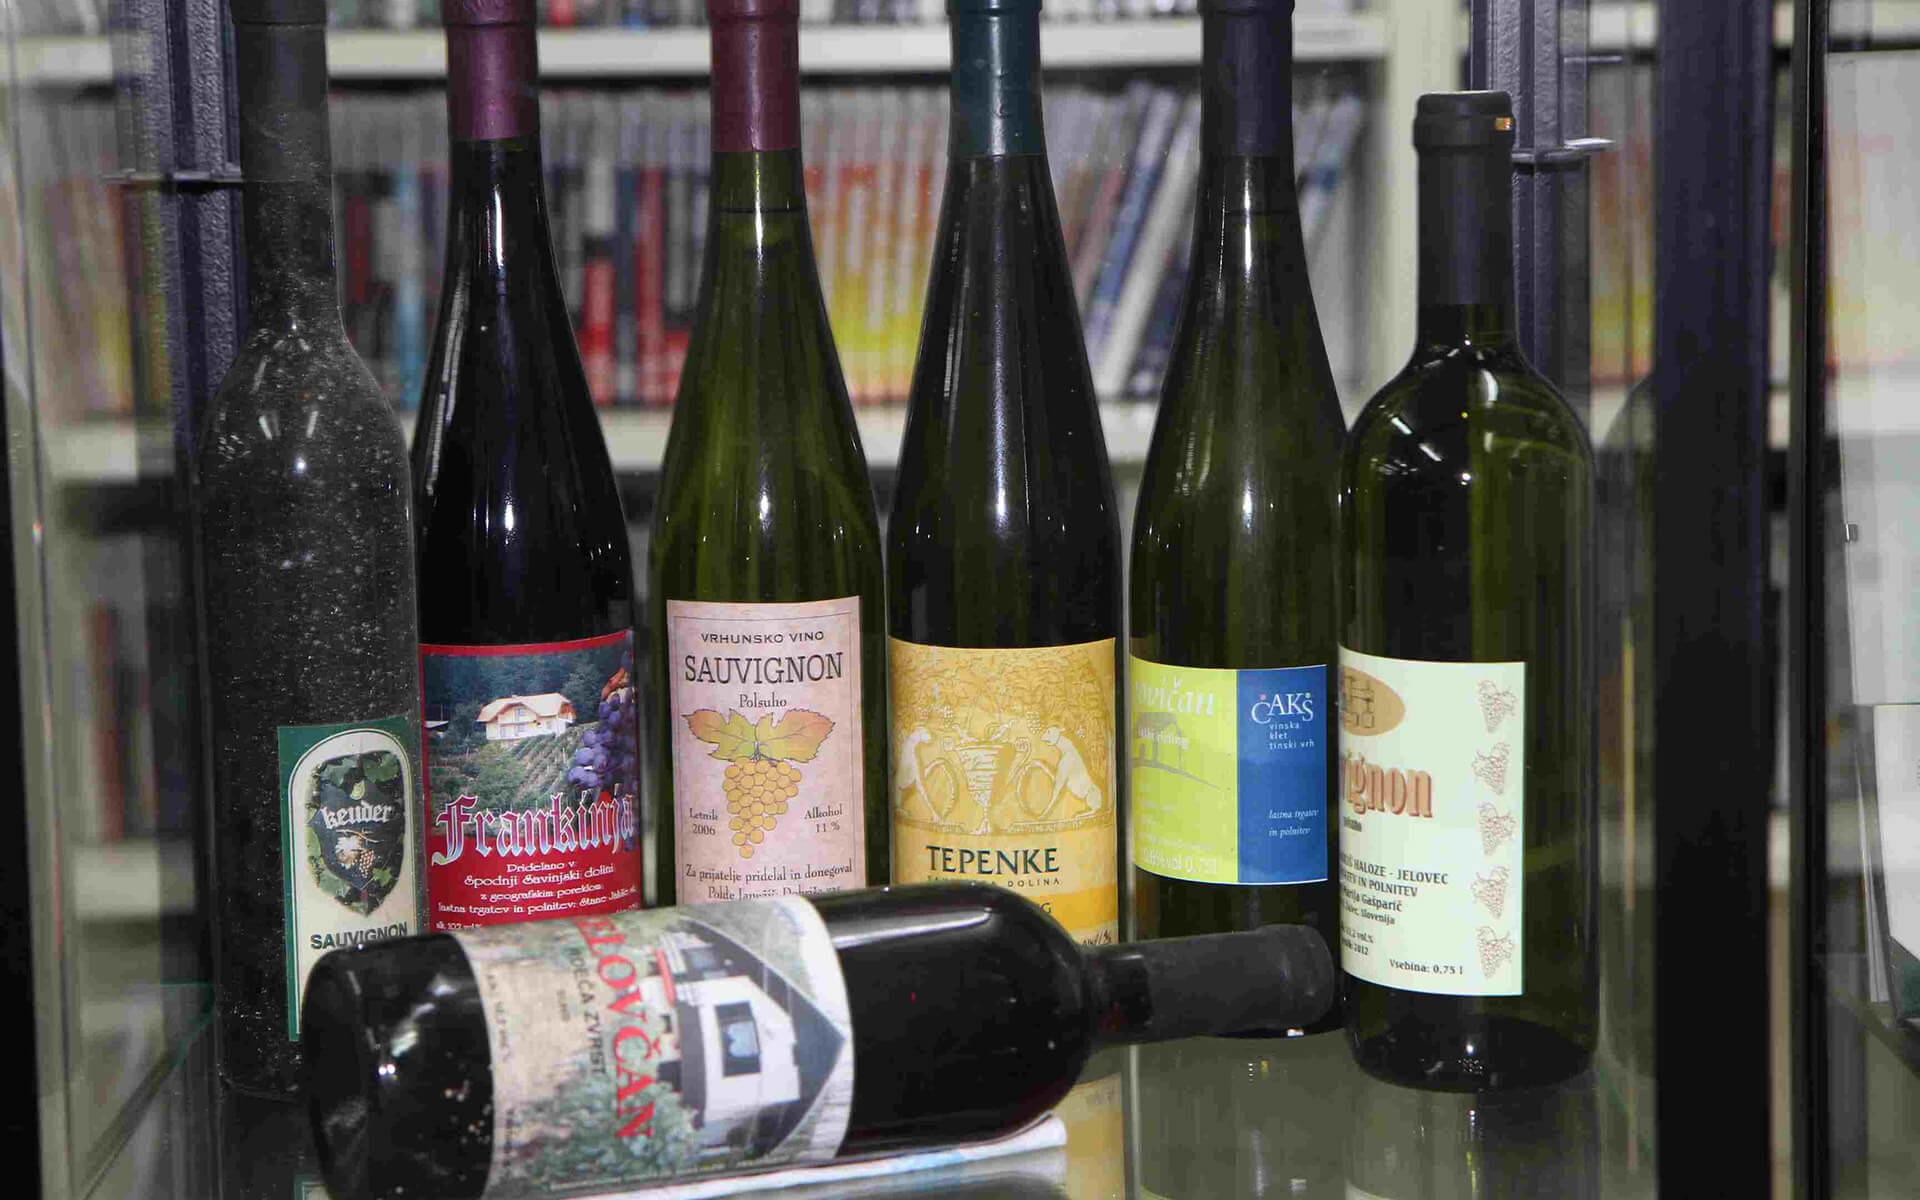 Predstavitev Društva savinjskih vinogradnikov Žalcu 2016